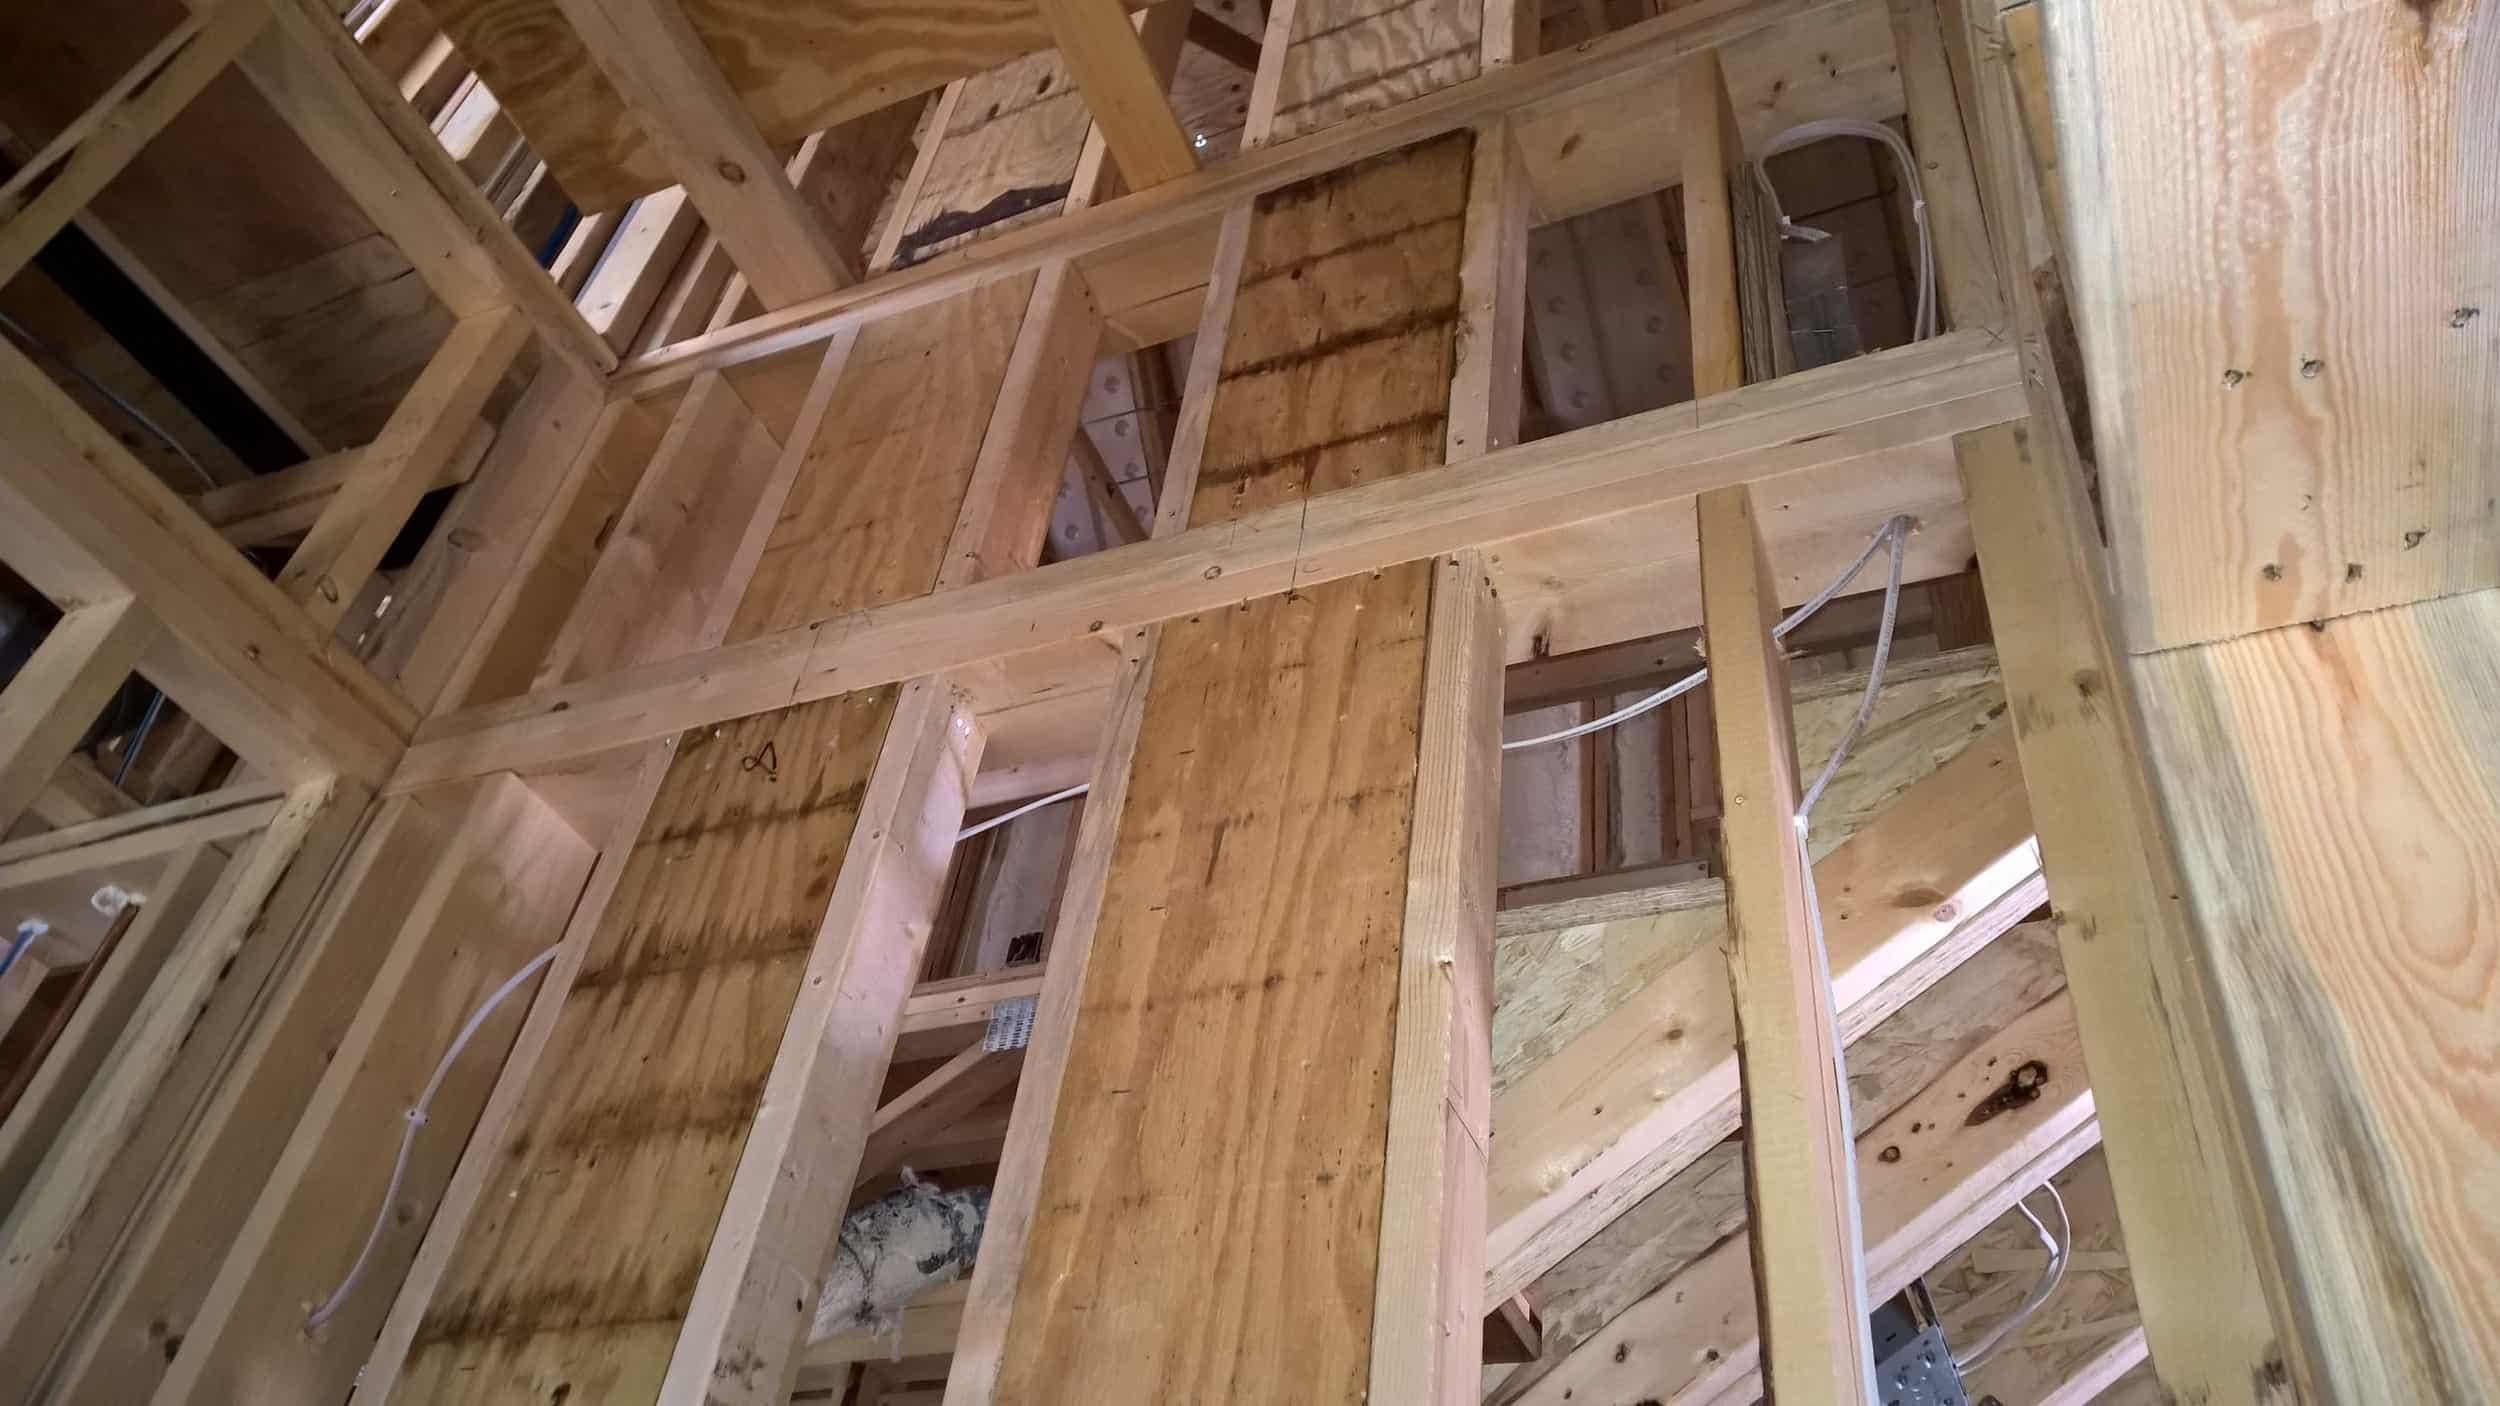 hoistway-construction2-min.jpg